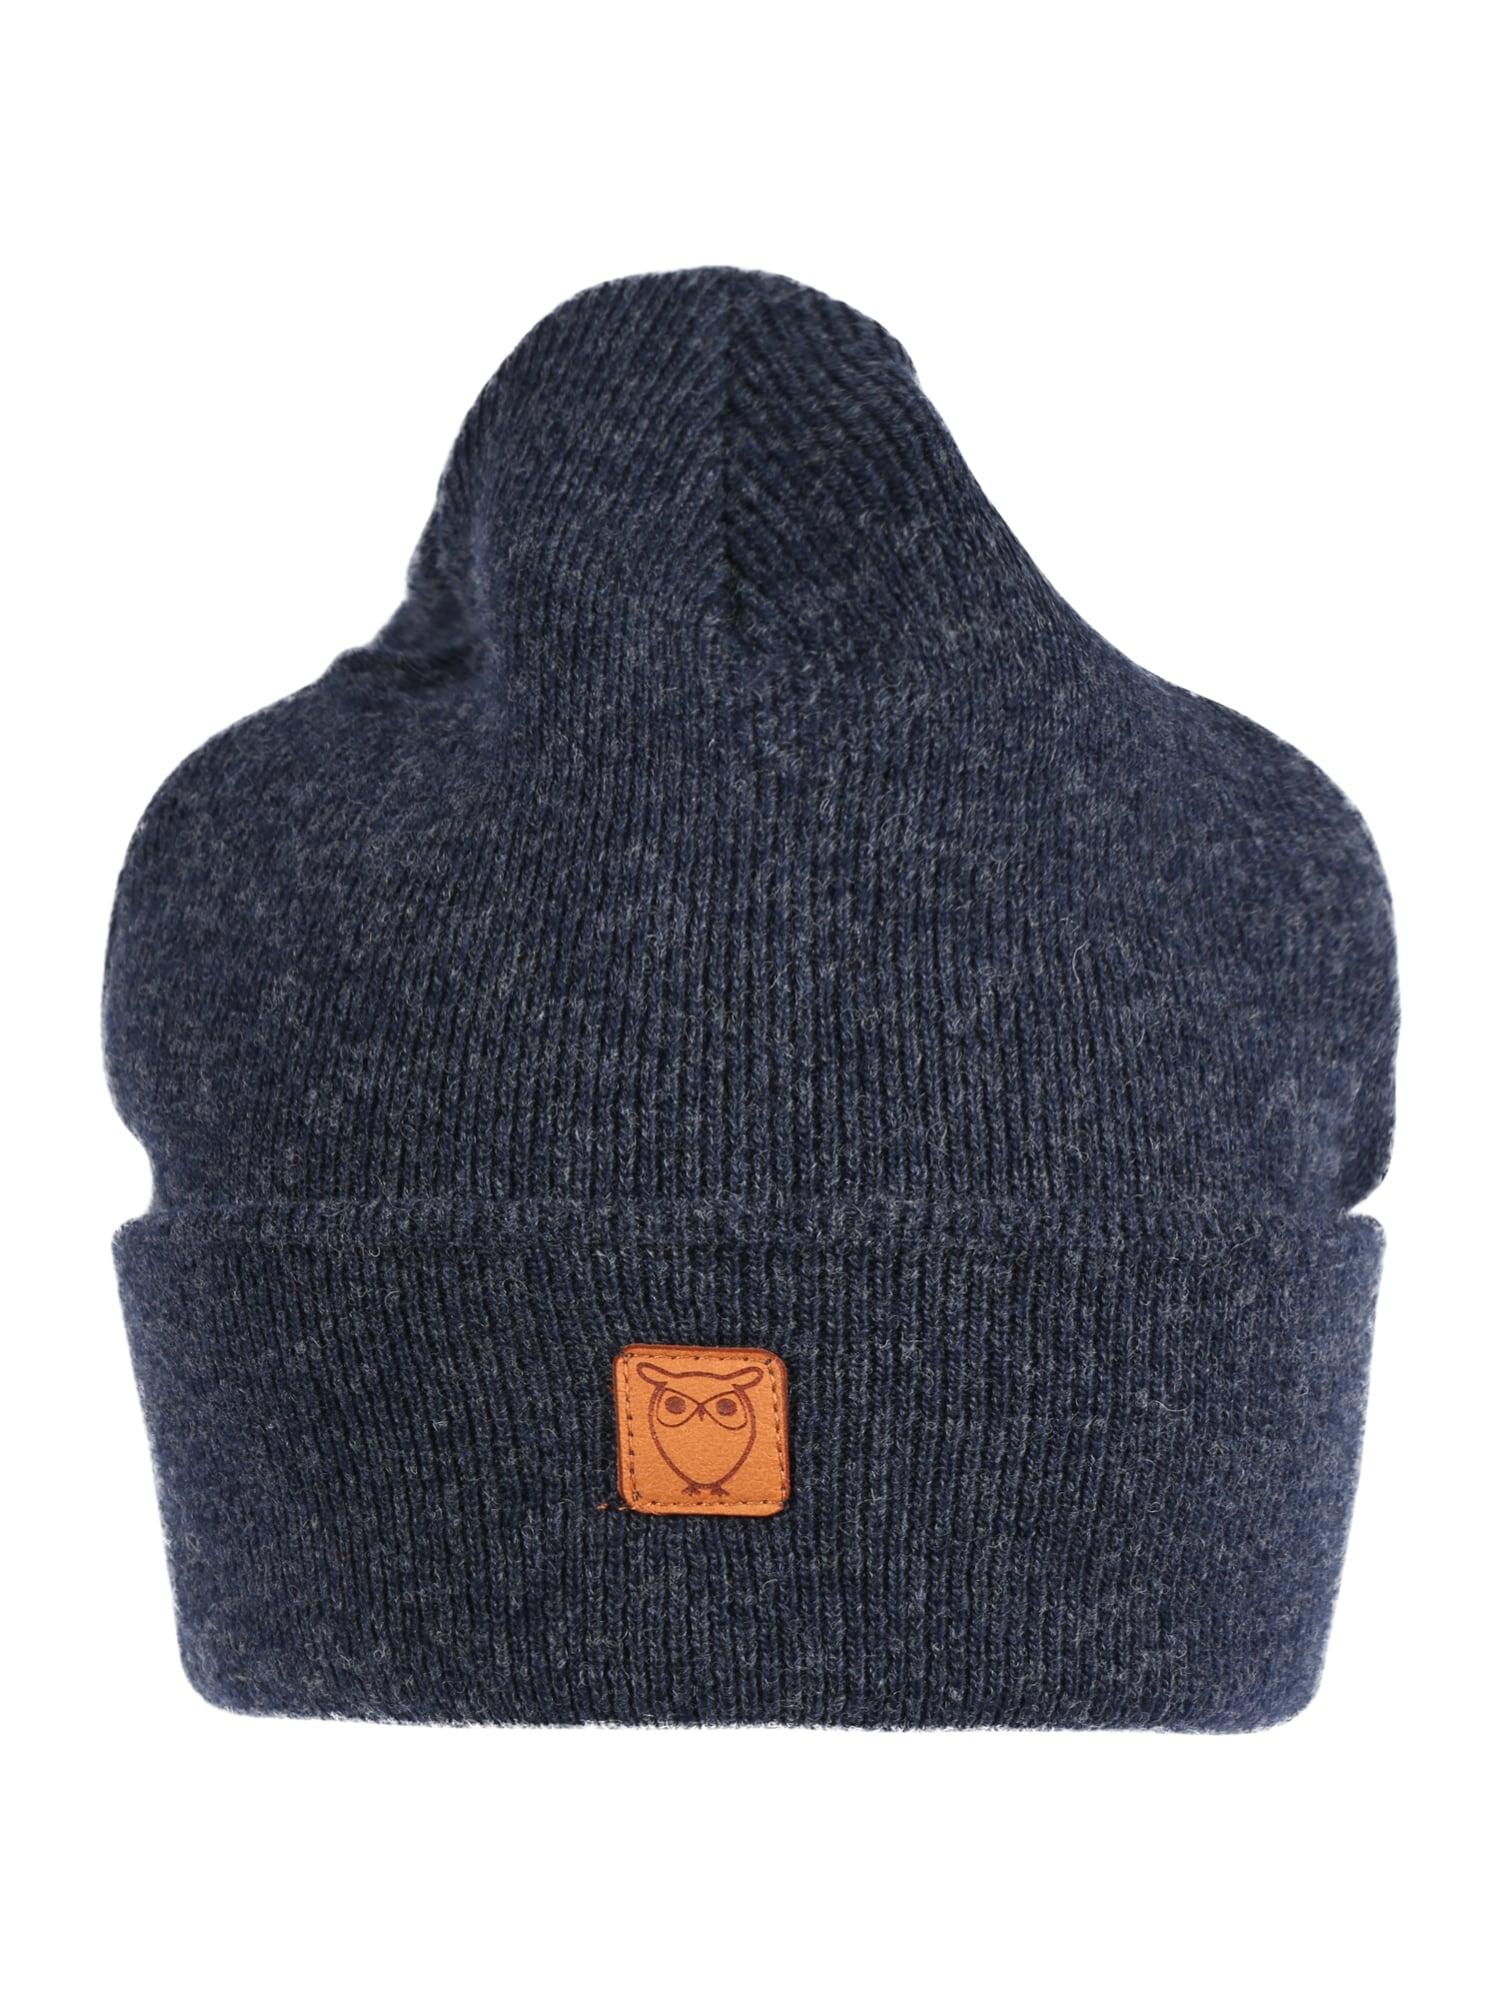 Muts 'Beanie organic wool - GOTS'